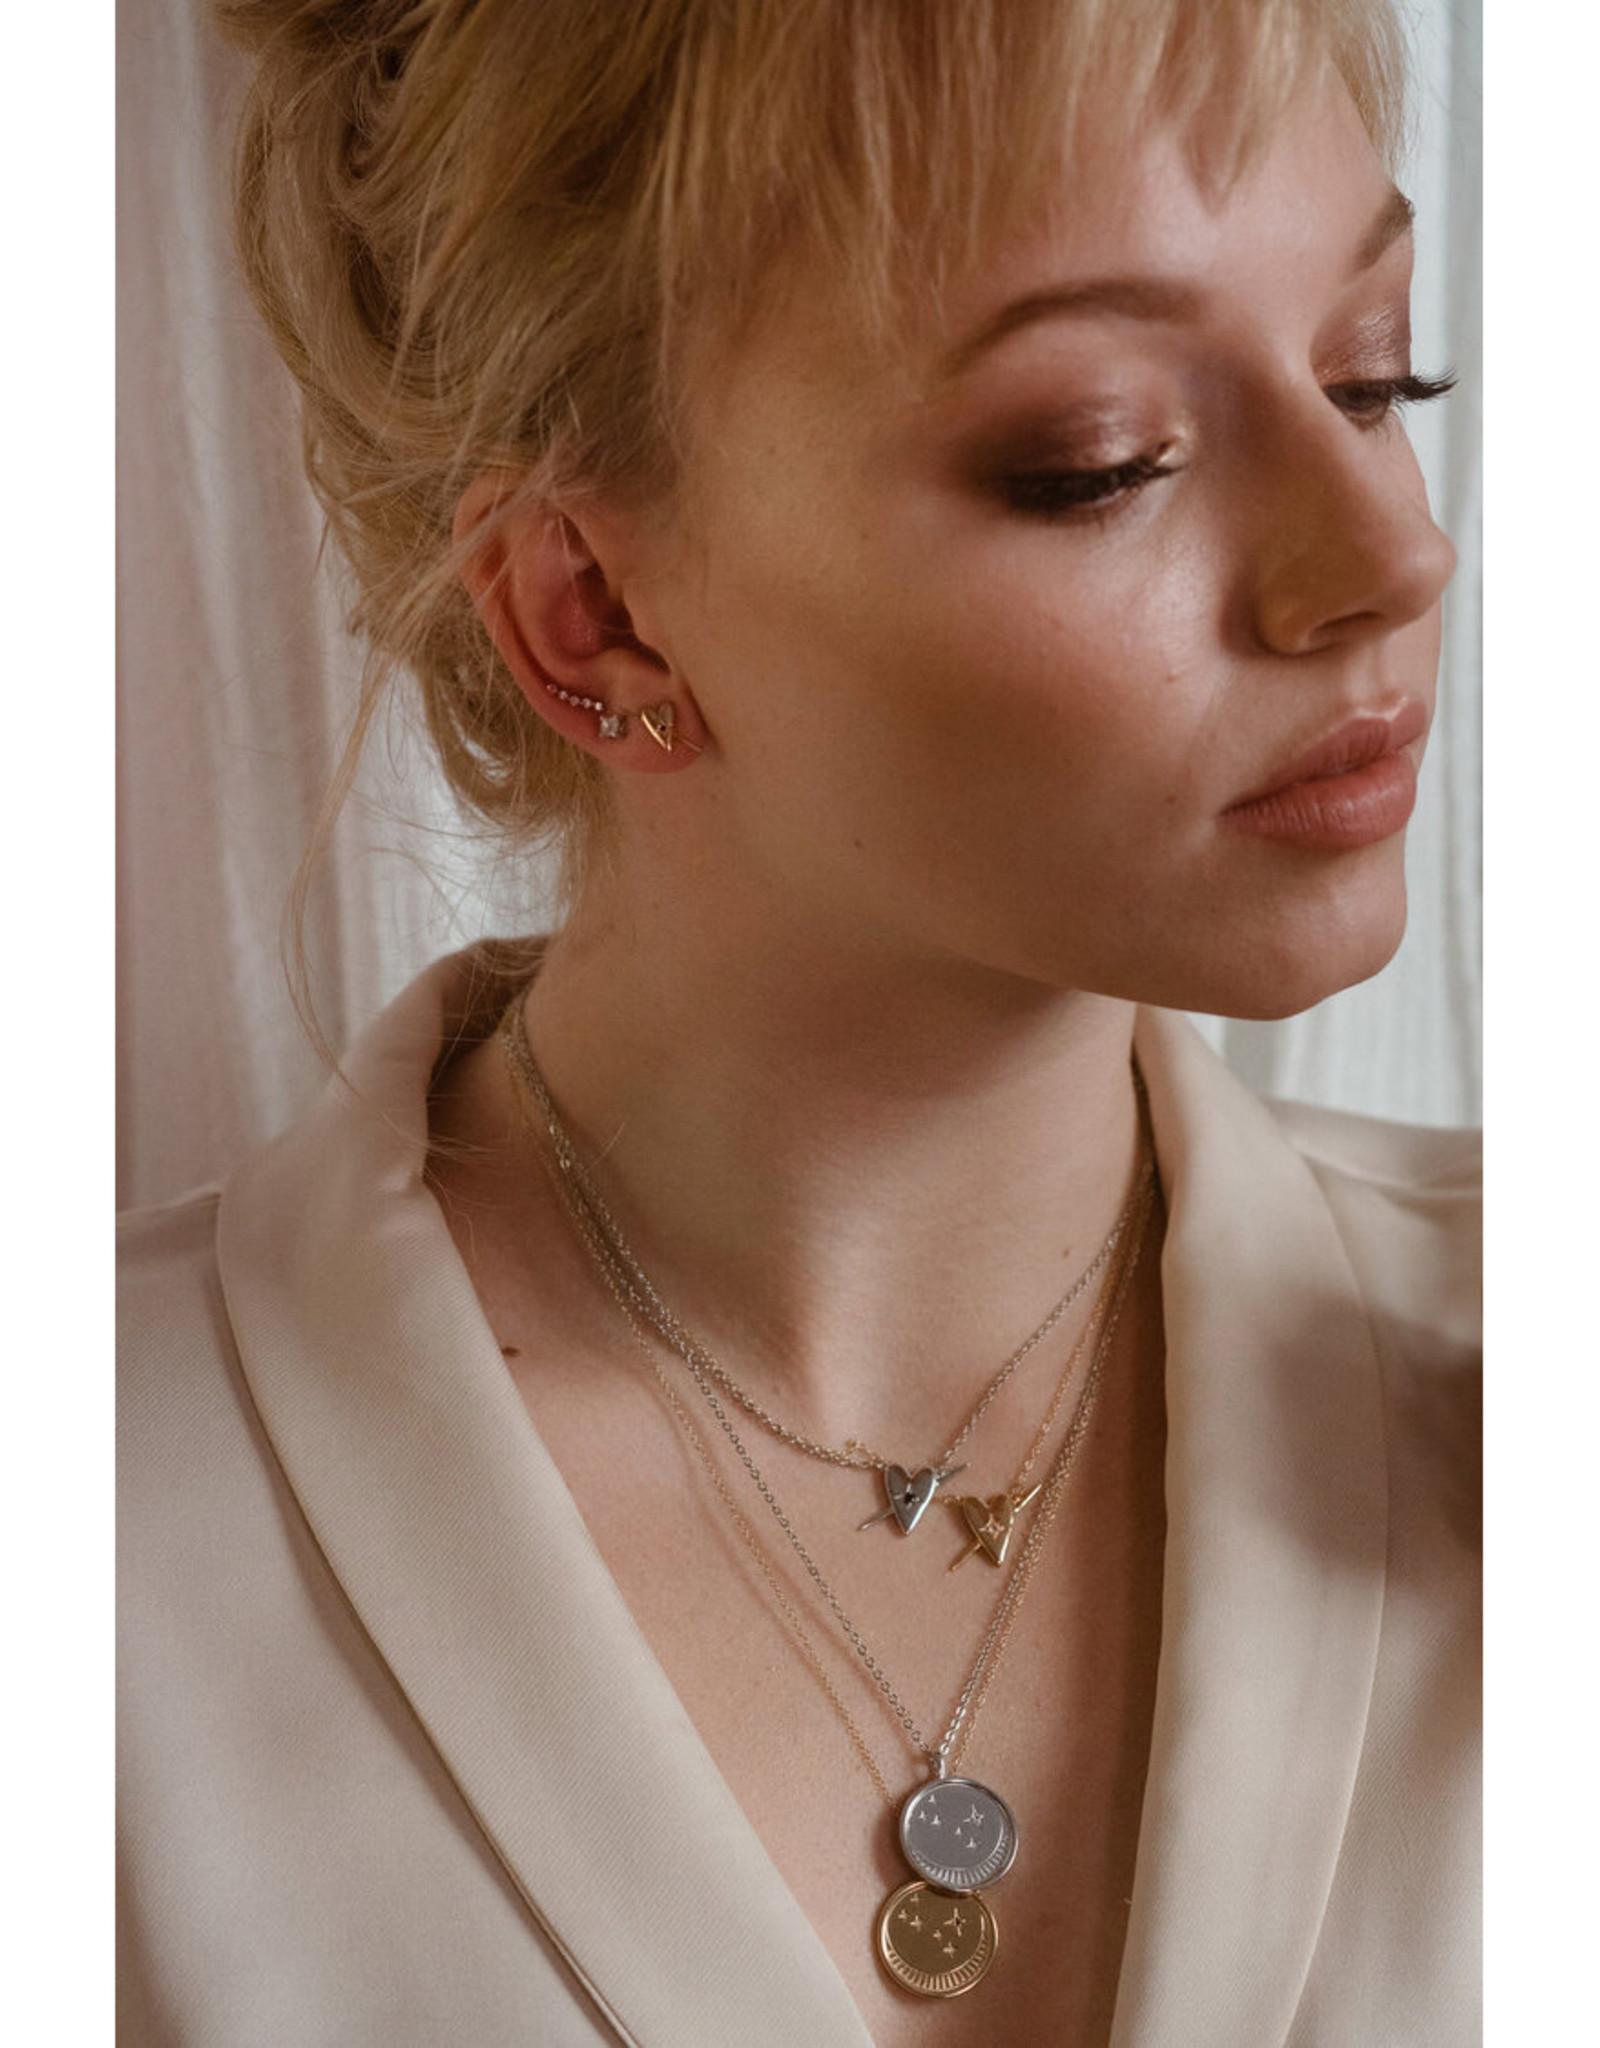 Sarah Mulder Jewelry Gold Lady Ear Climbers - Onyx